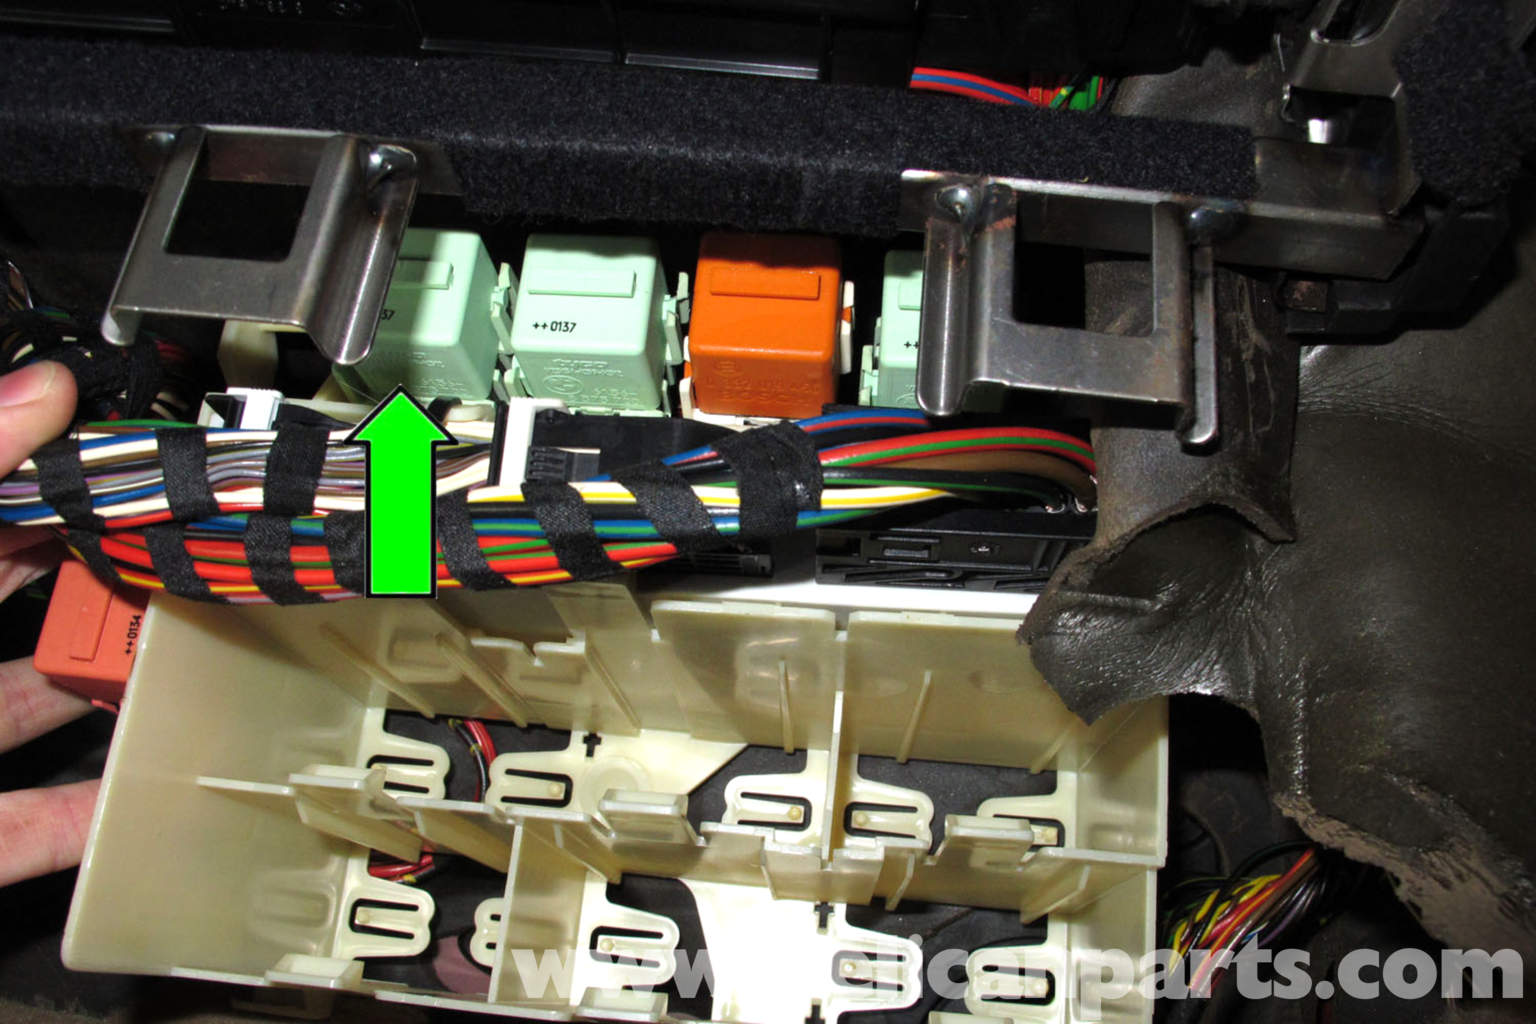 1997 bmw 328i fuse box diagram minn kota power drive 55 wiring e46 fuel pump testing | 325i (2001-2005), 325xi 325ci (2001-2006 ...